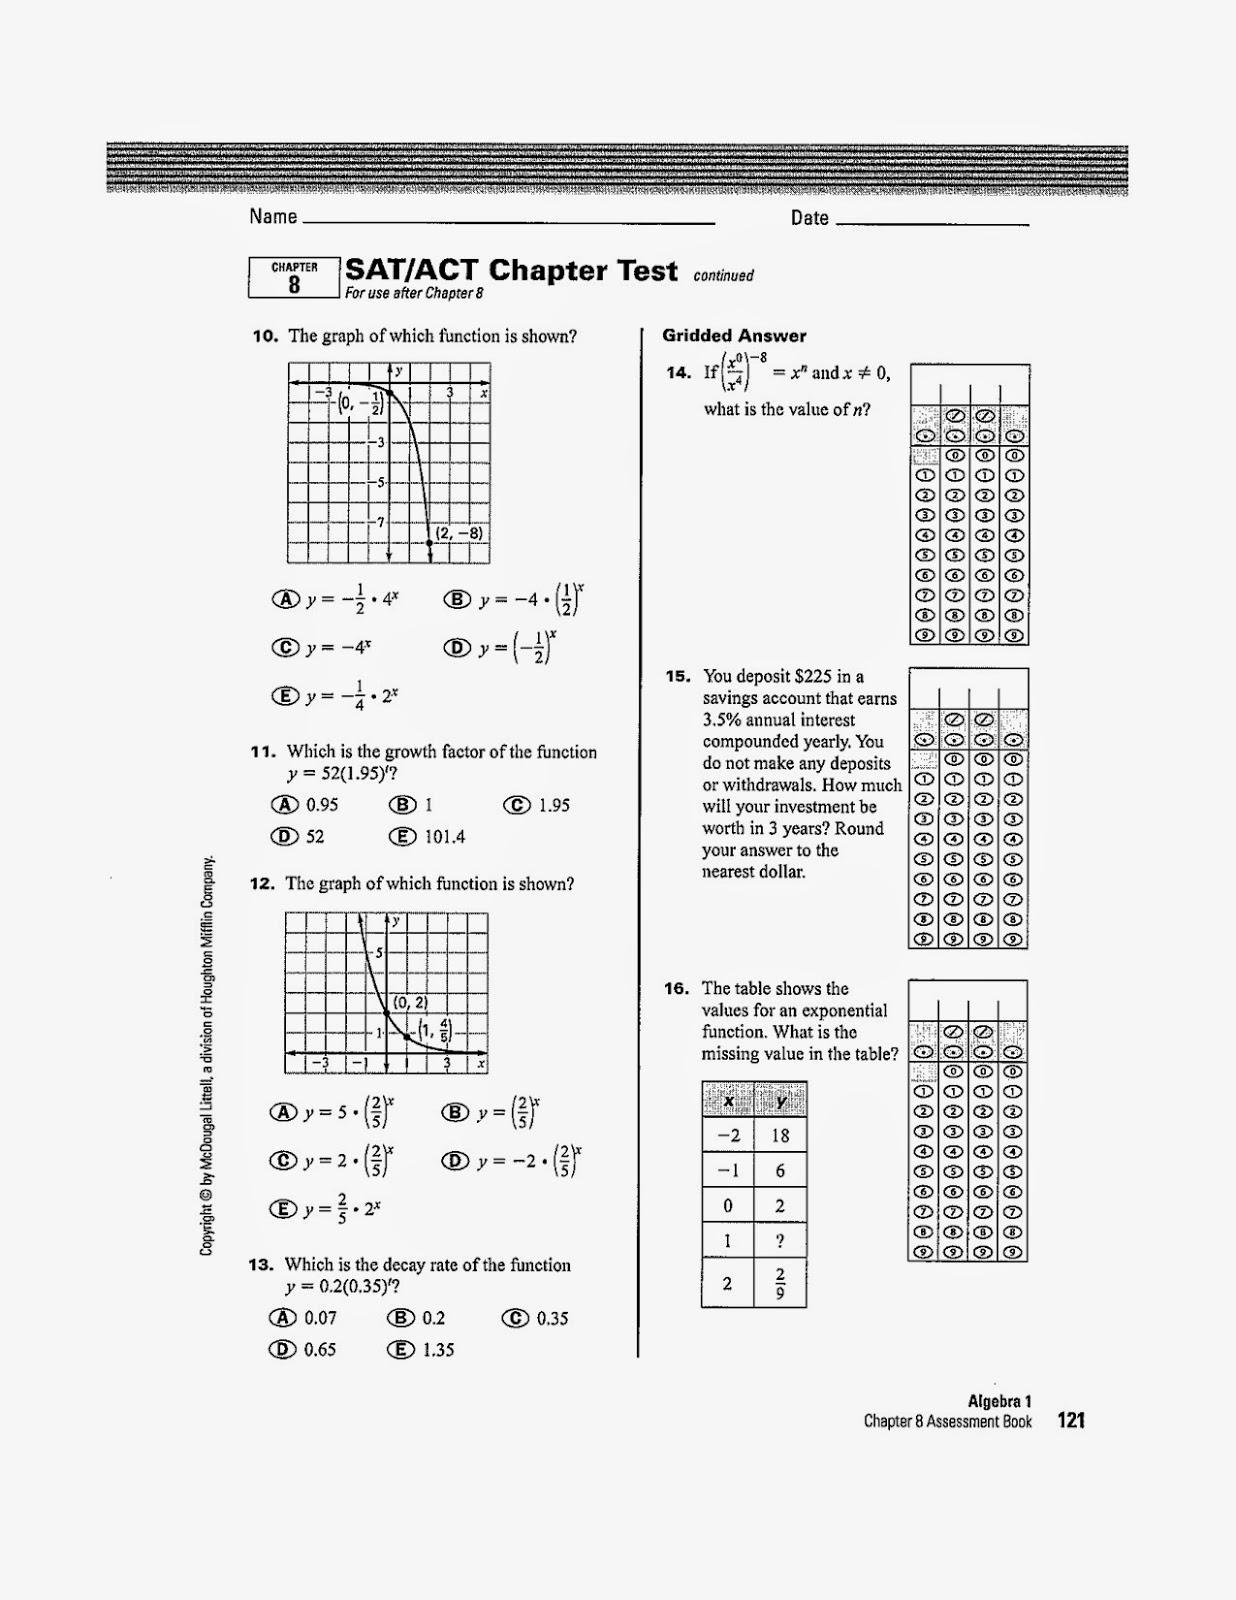 8th grade math exam practice